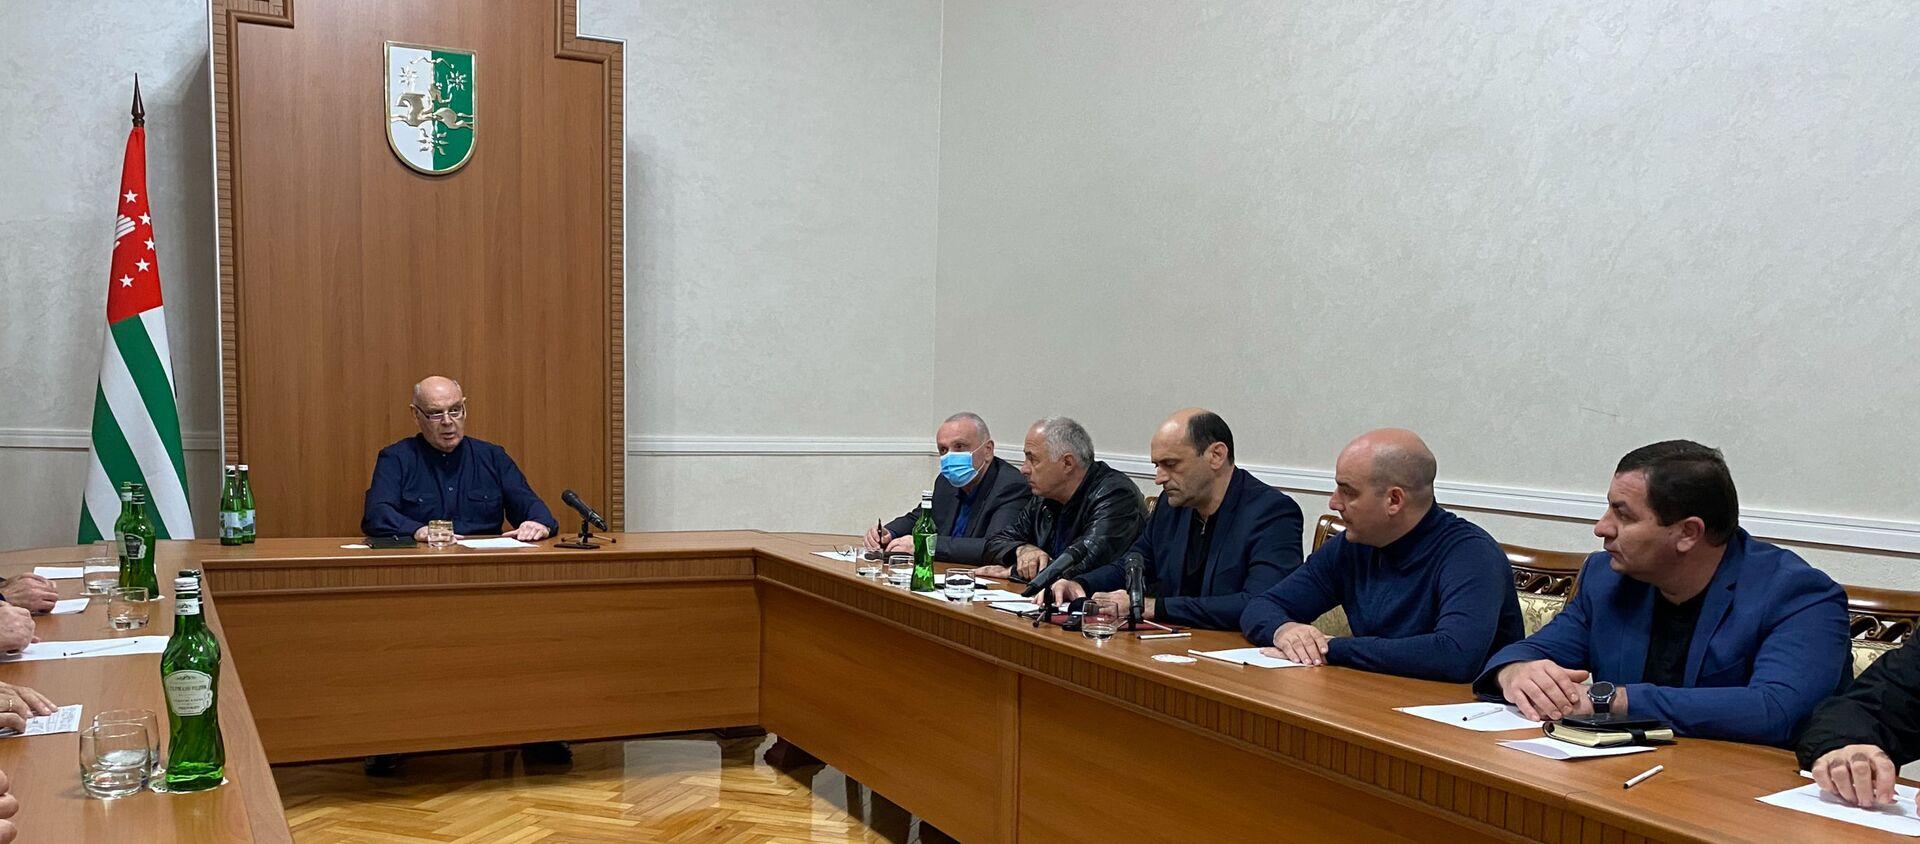 Заседание в администрации президнта  - Sputnik Абхазия, 1920, 03.10.2021